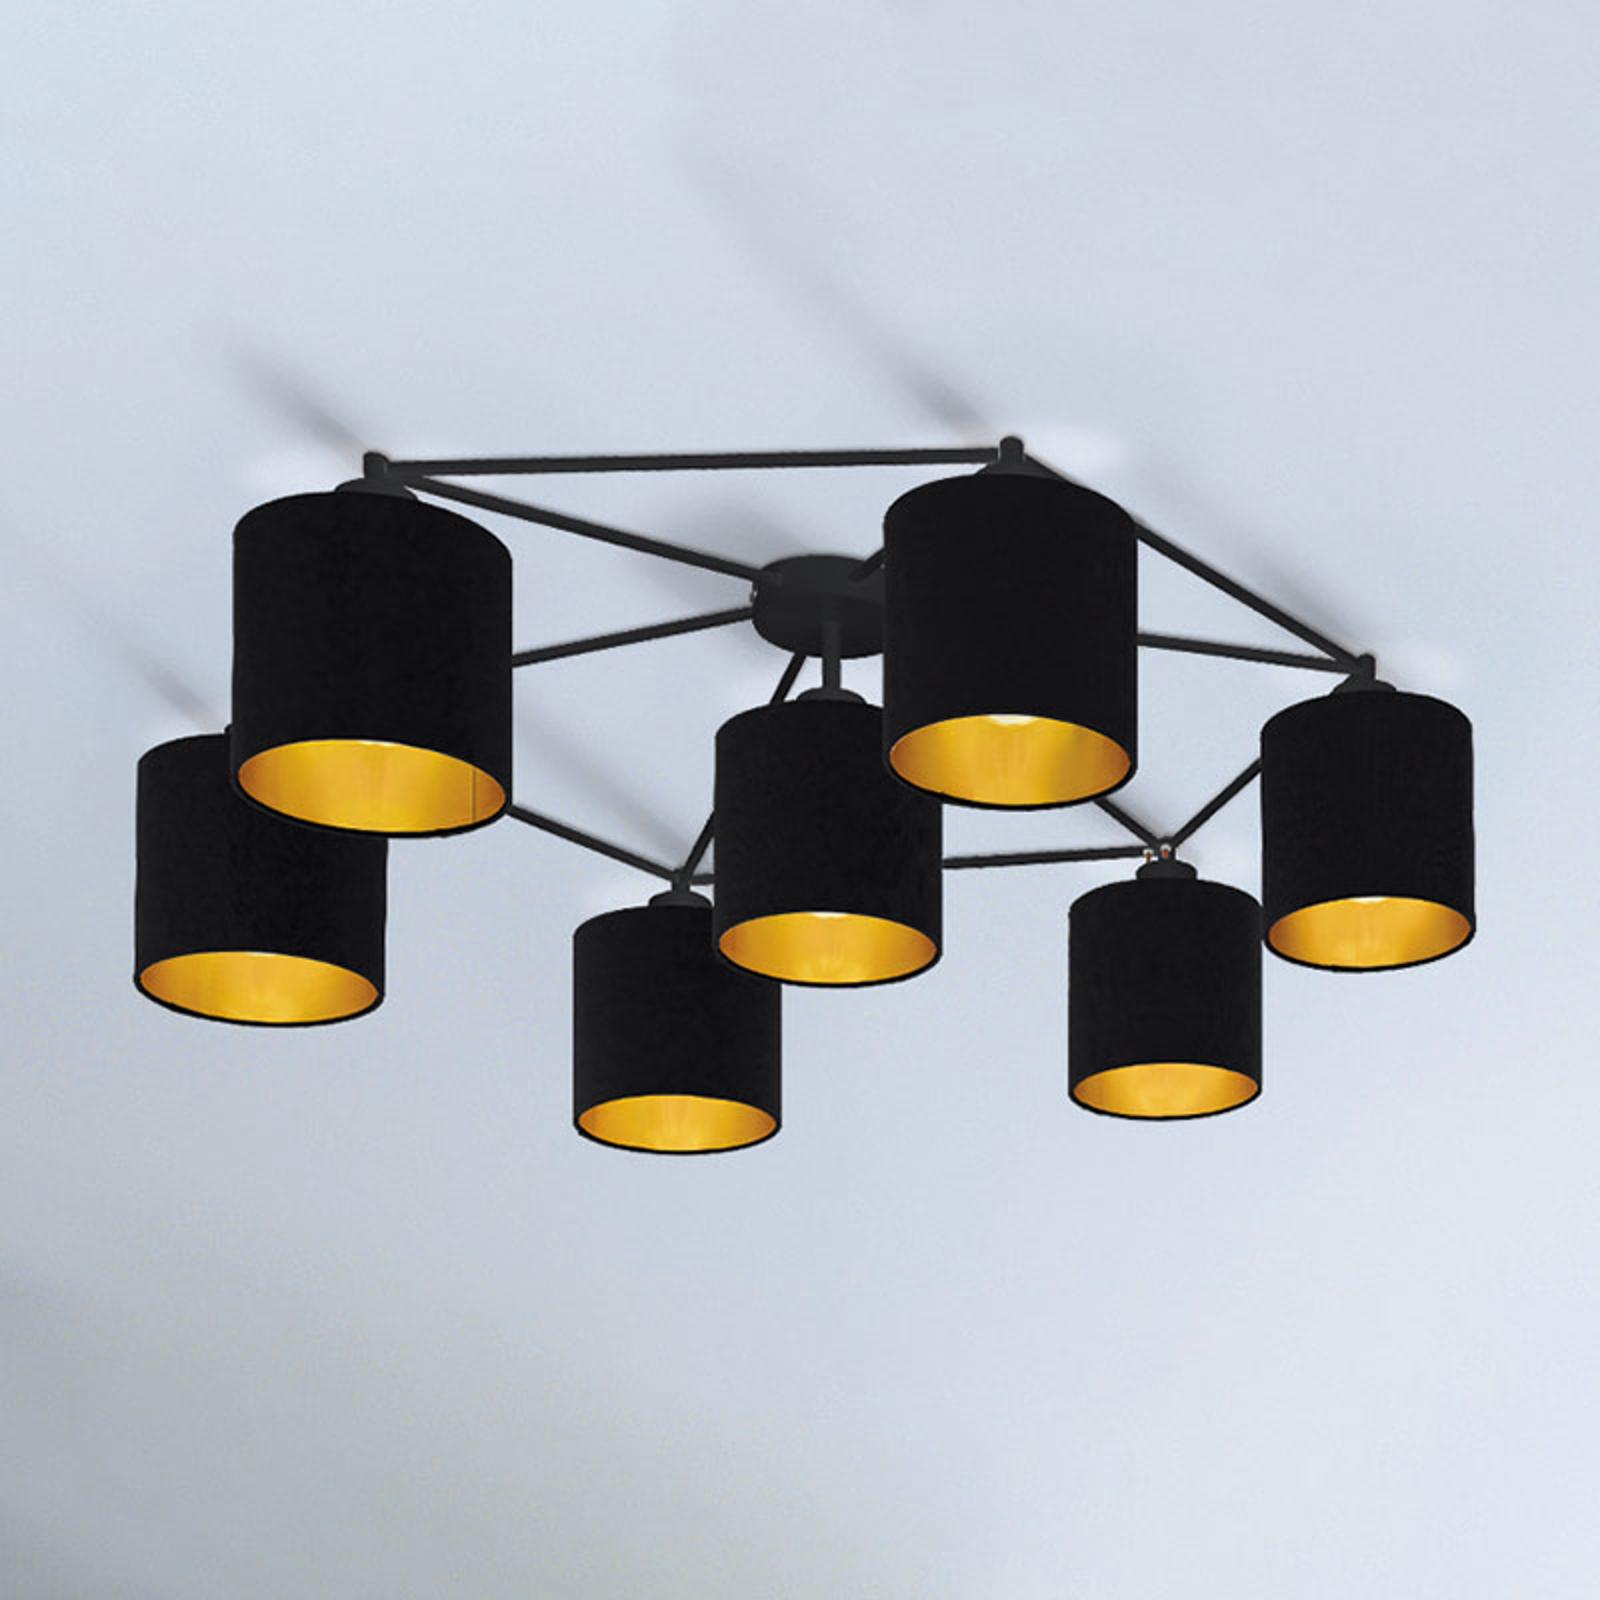 Lampa sufitowa Staiti czarna z kloszami